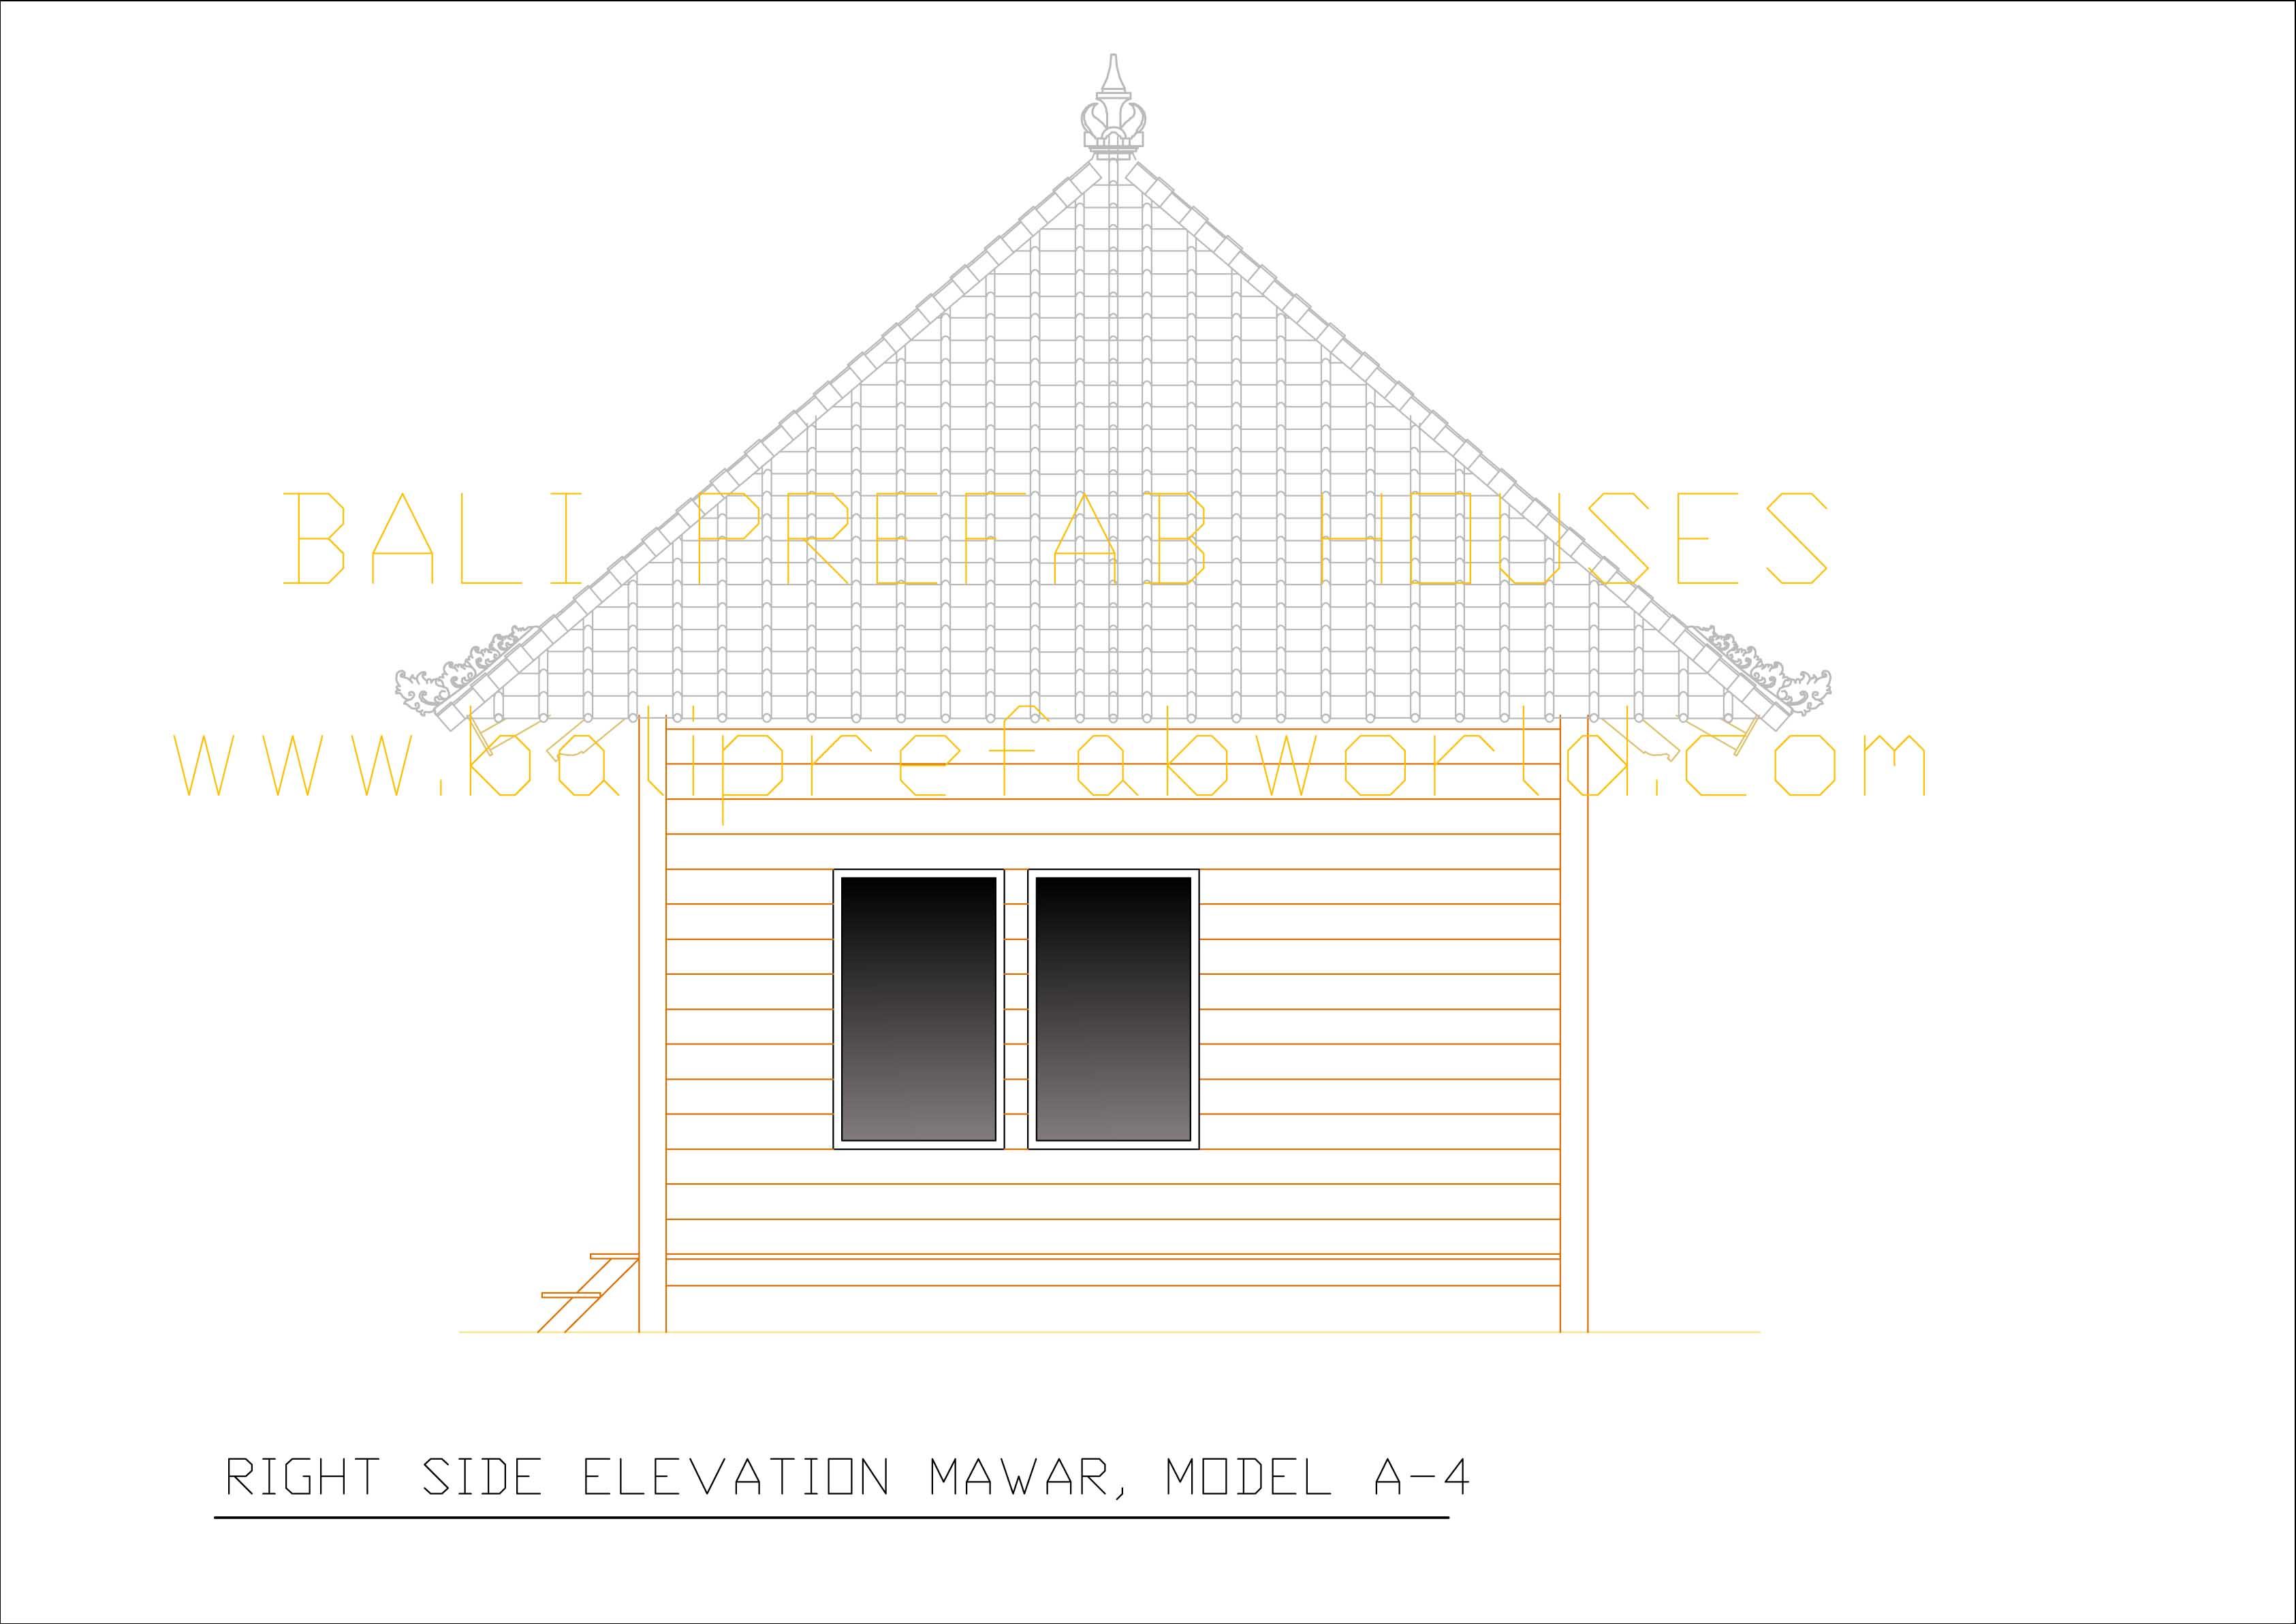 Right Side Elevation Plan : Mawar